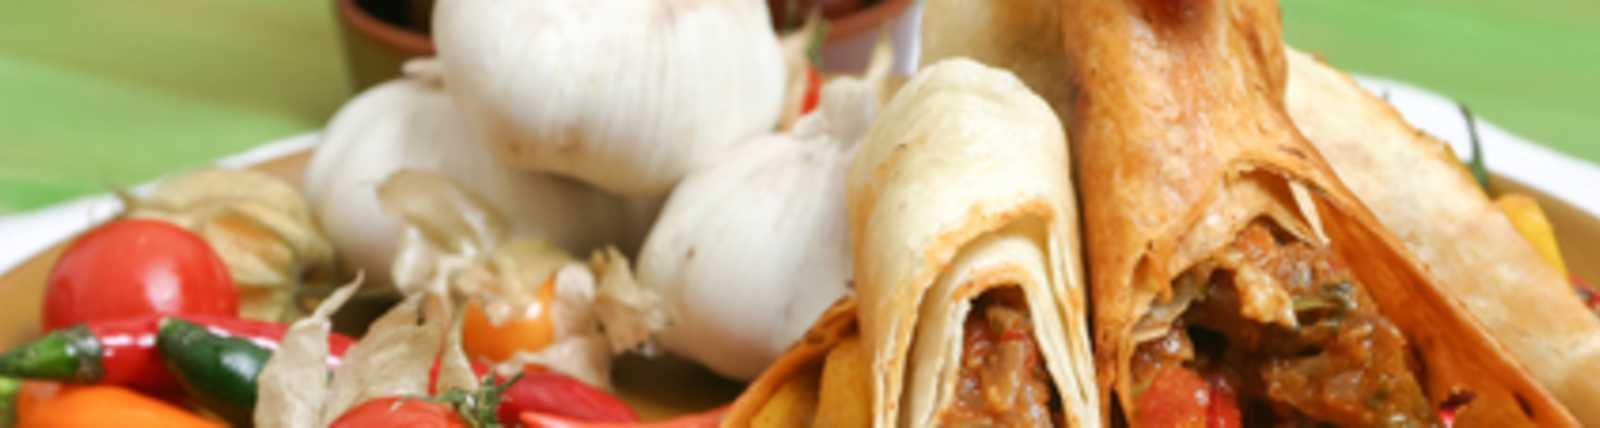 Arturo_s_Mexican_Restaurant.jpg